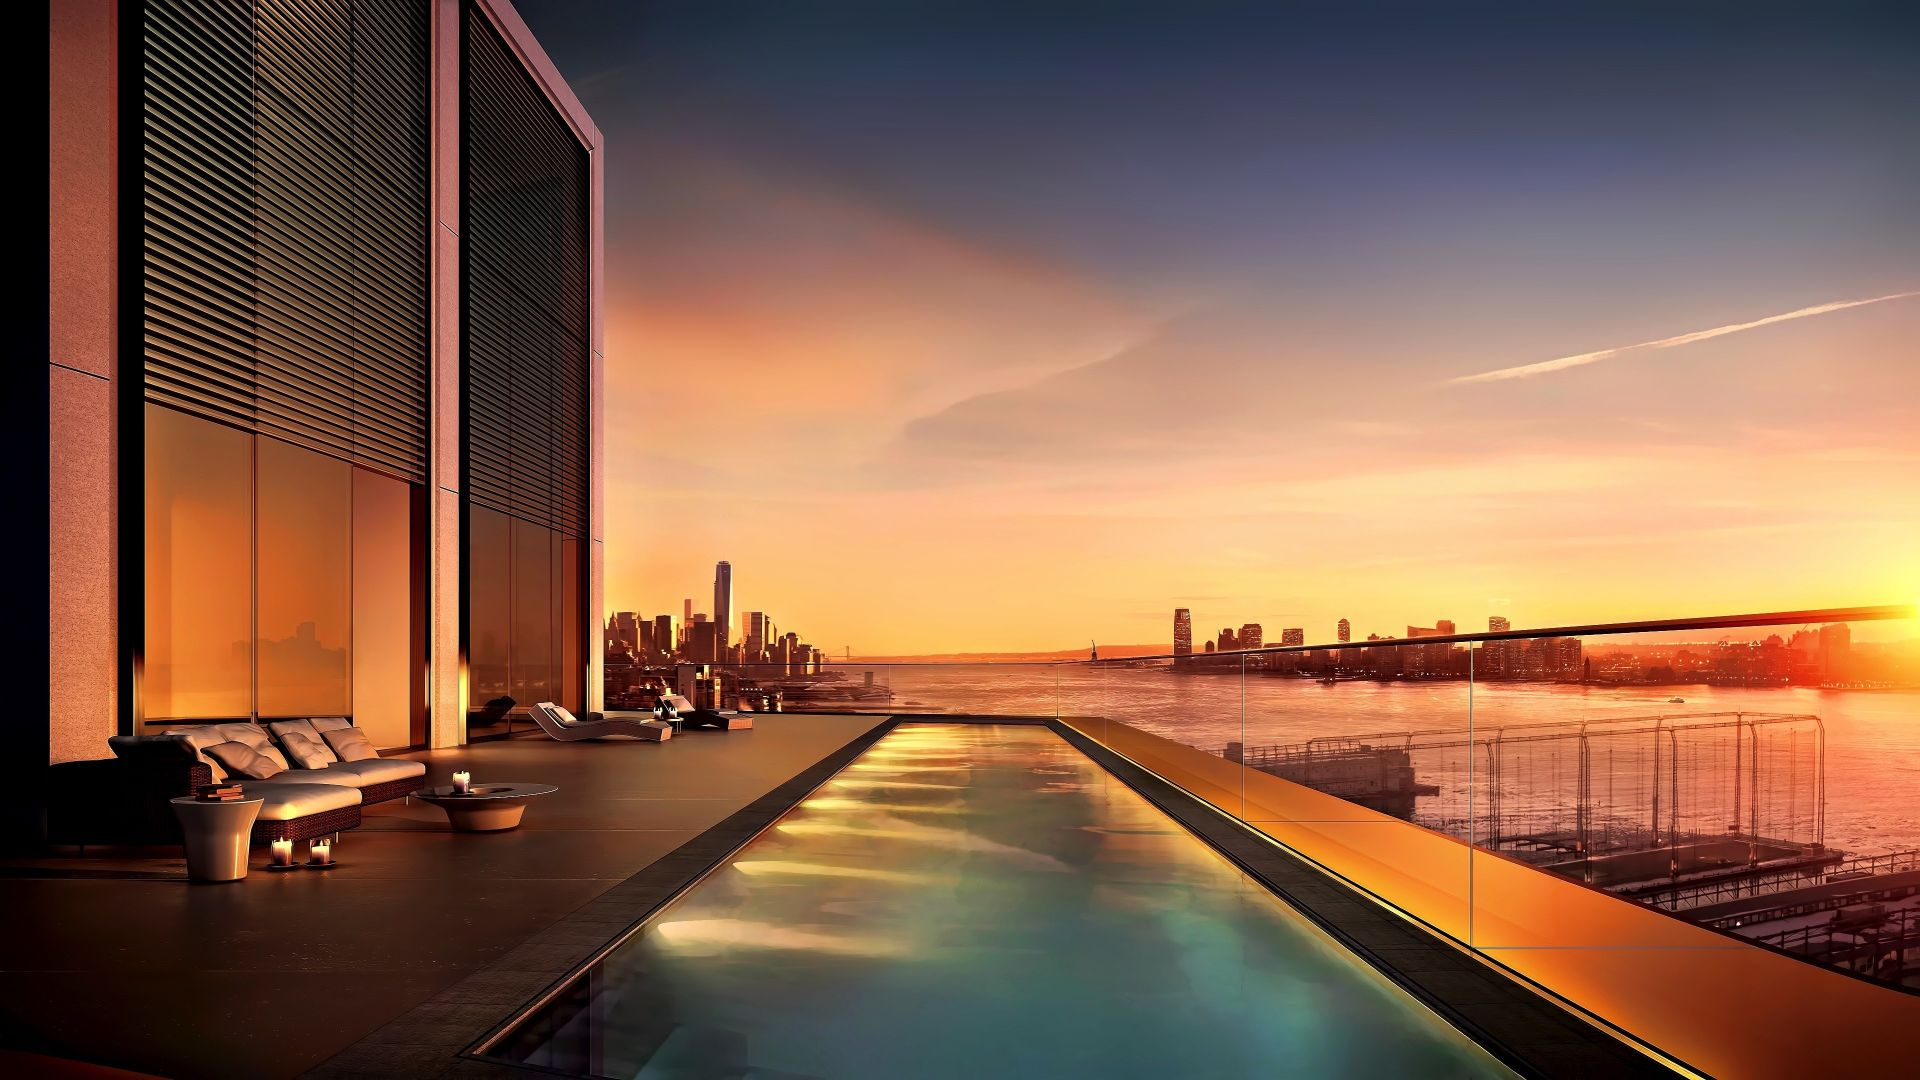 Wallpaper Sunset, new york, city, swimming pool, 4k